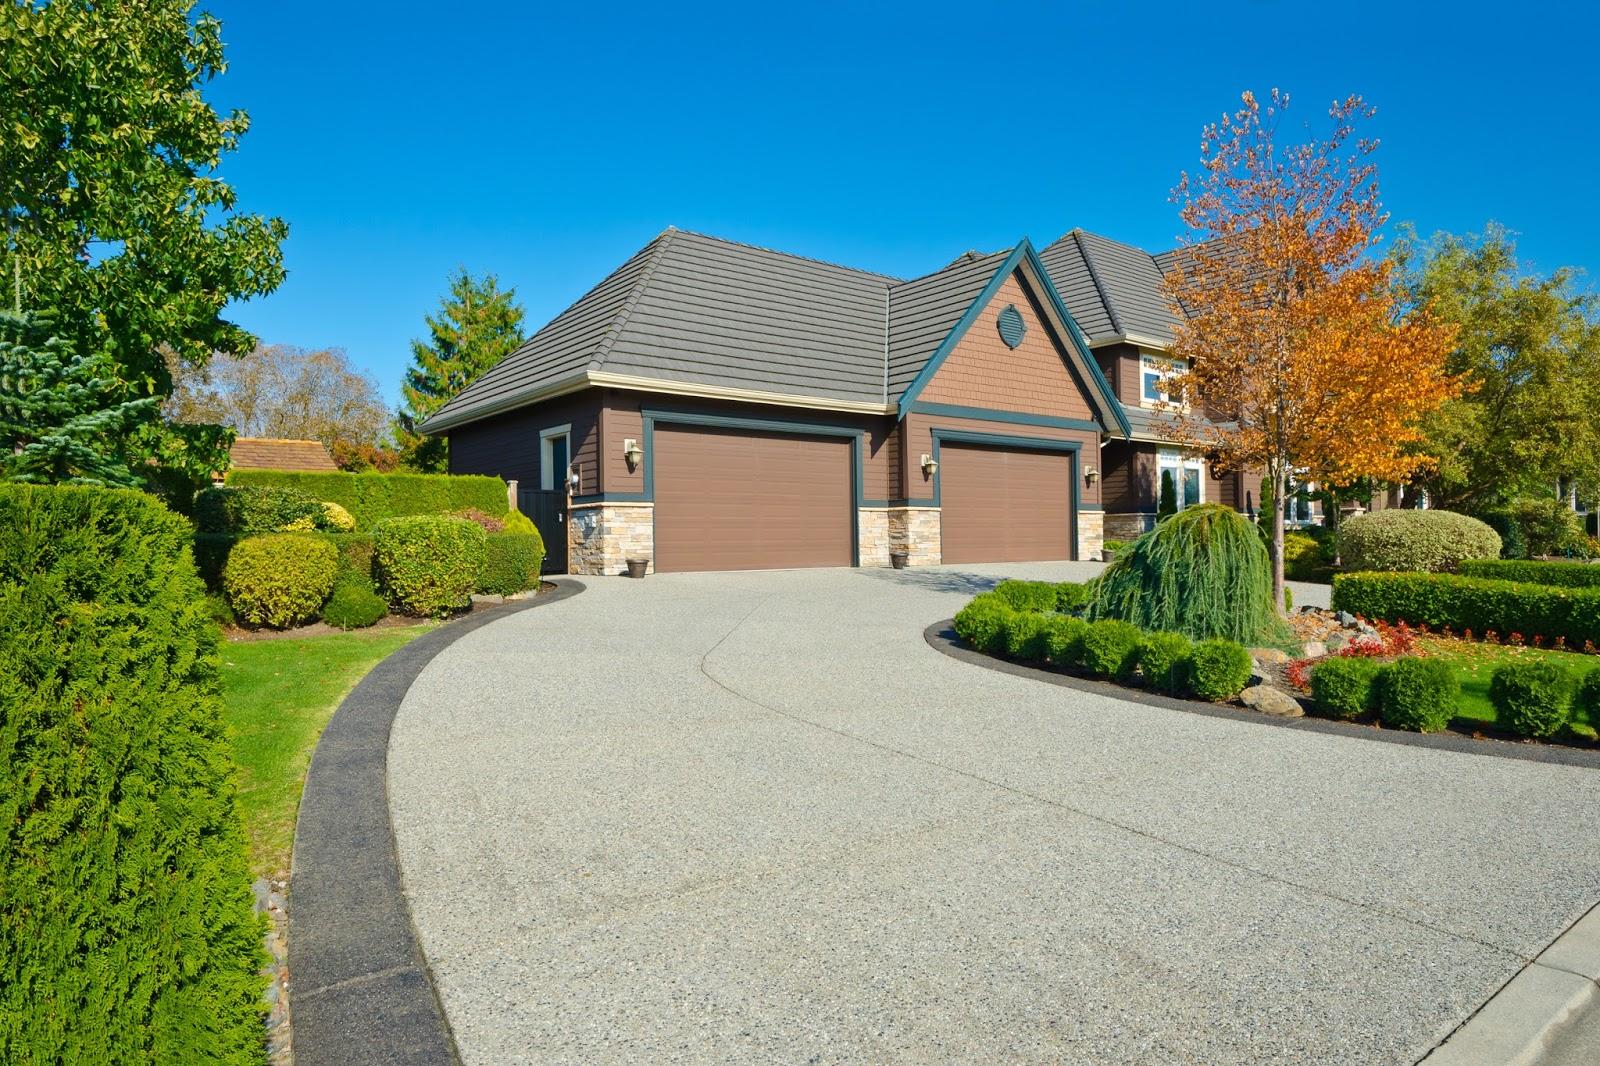 paint-a-house-exterior